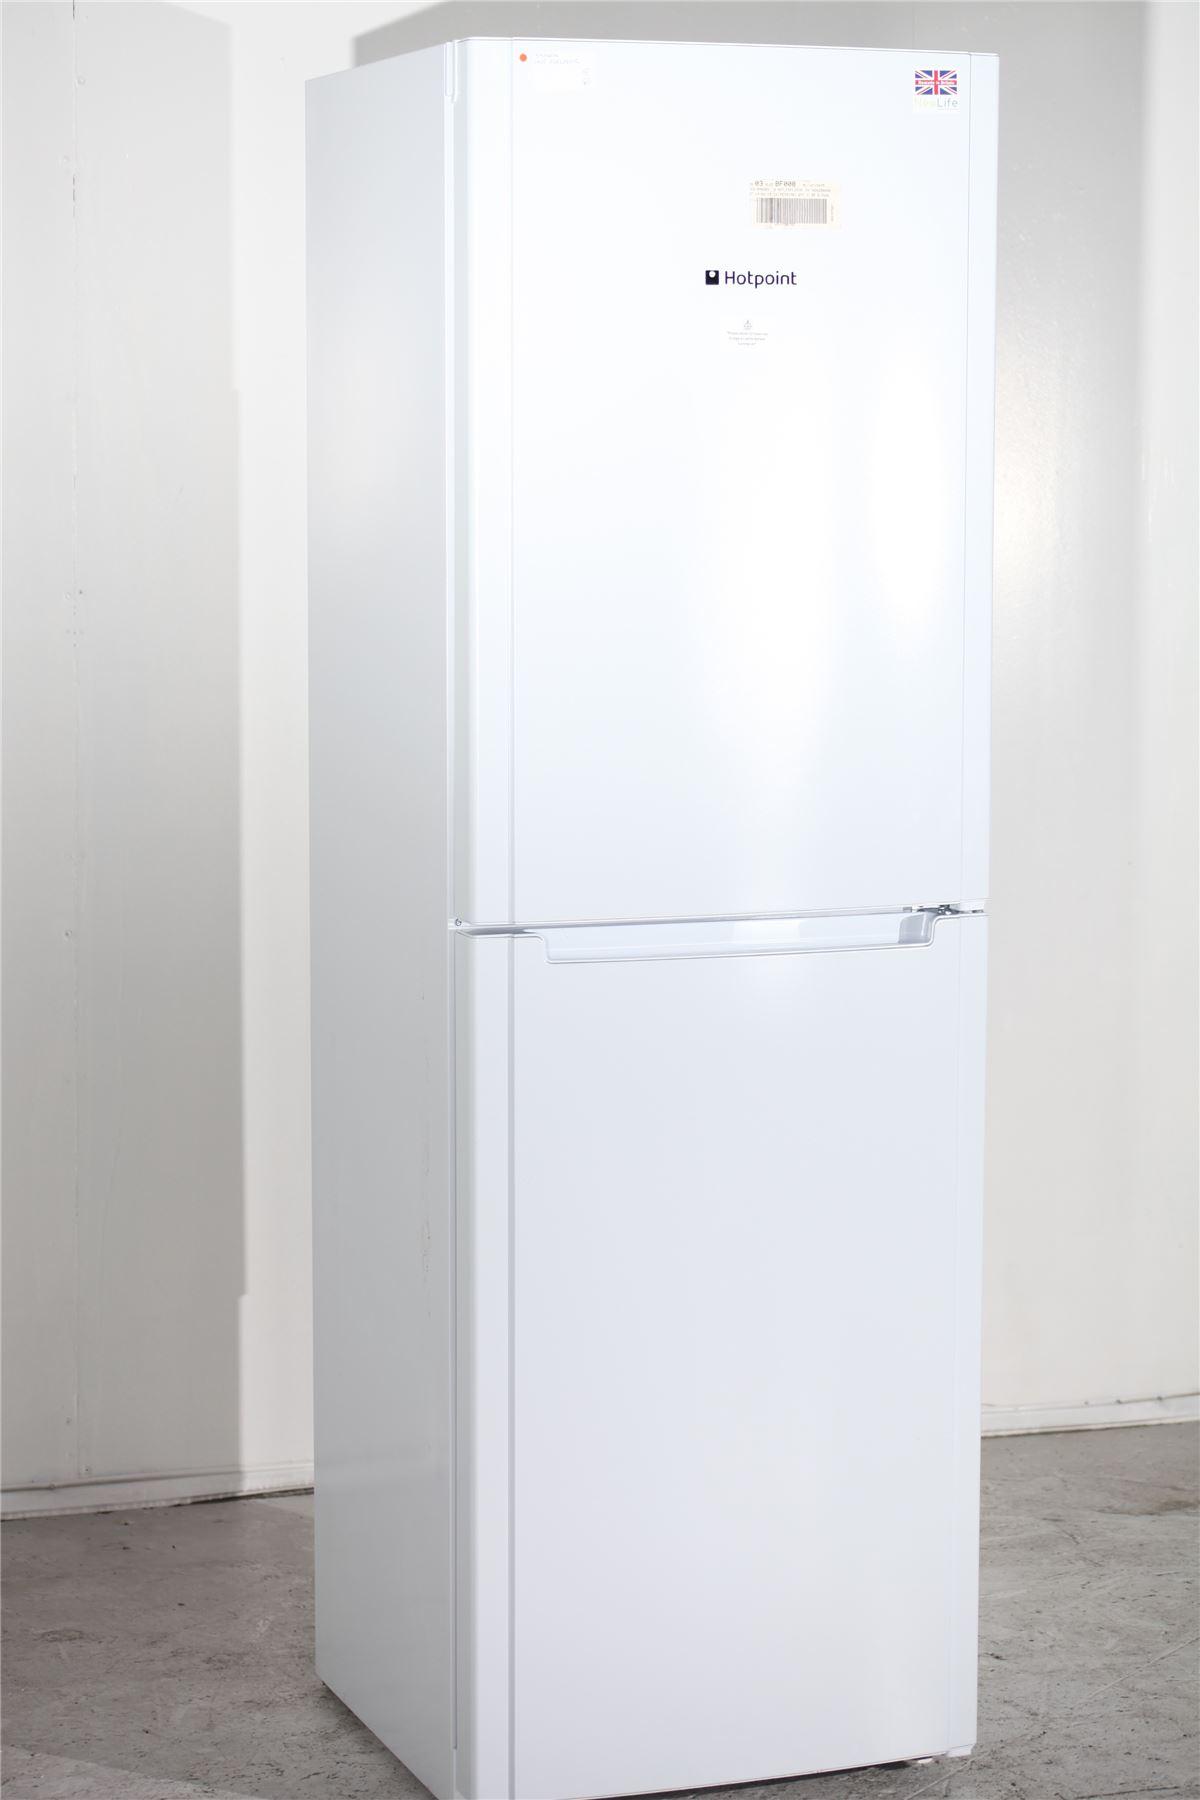 preloved hotpoint fridge freezer fsfl1810g white for. Black Bedroom Furniture Sets. Home Design Ideas